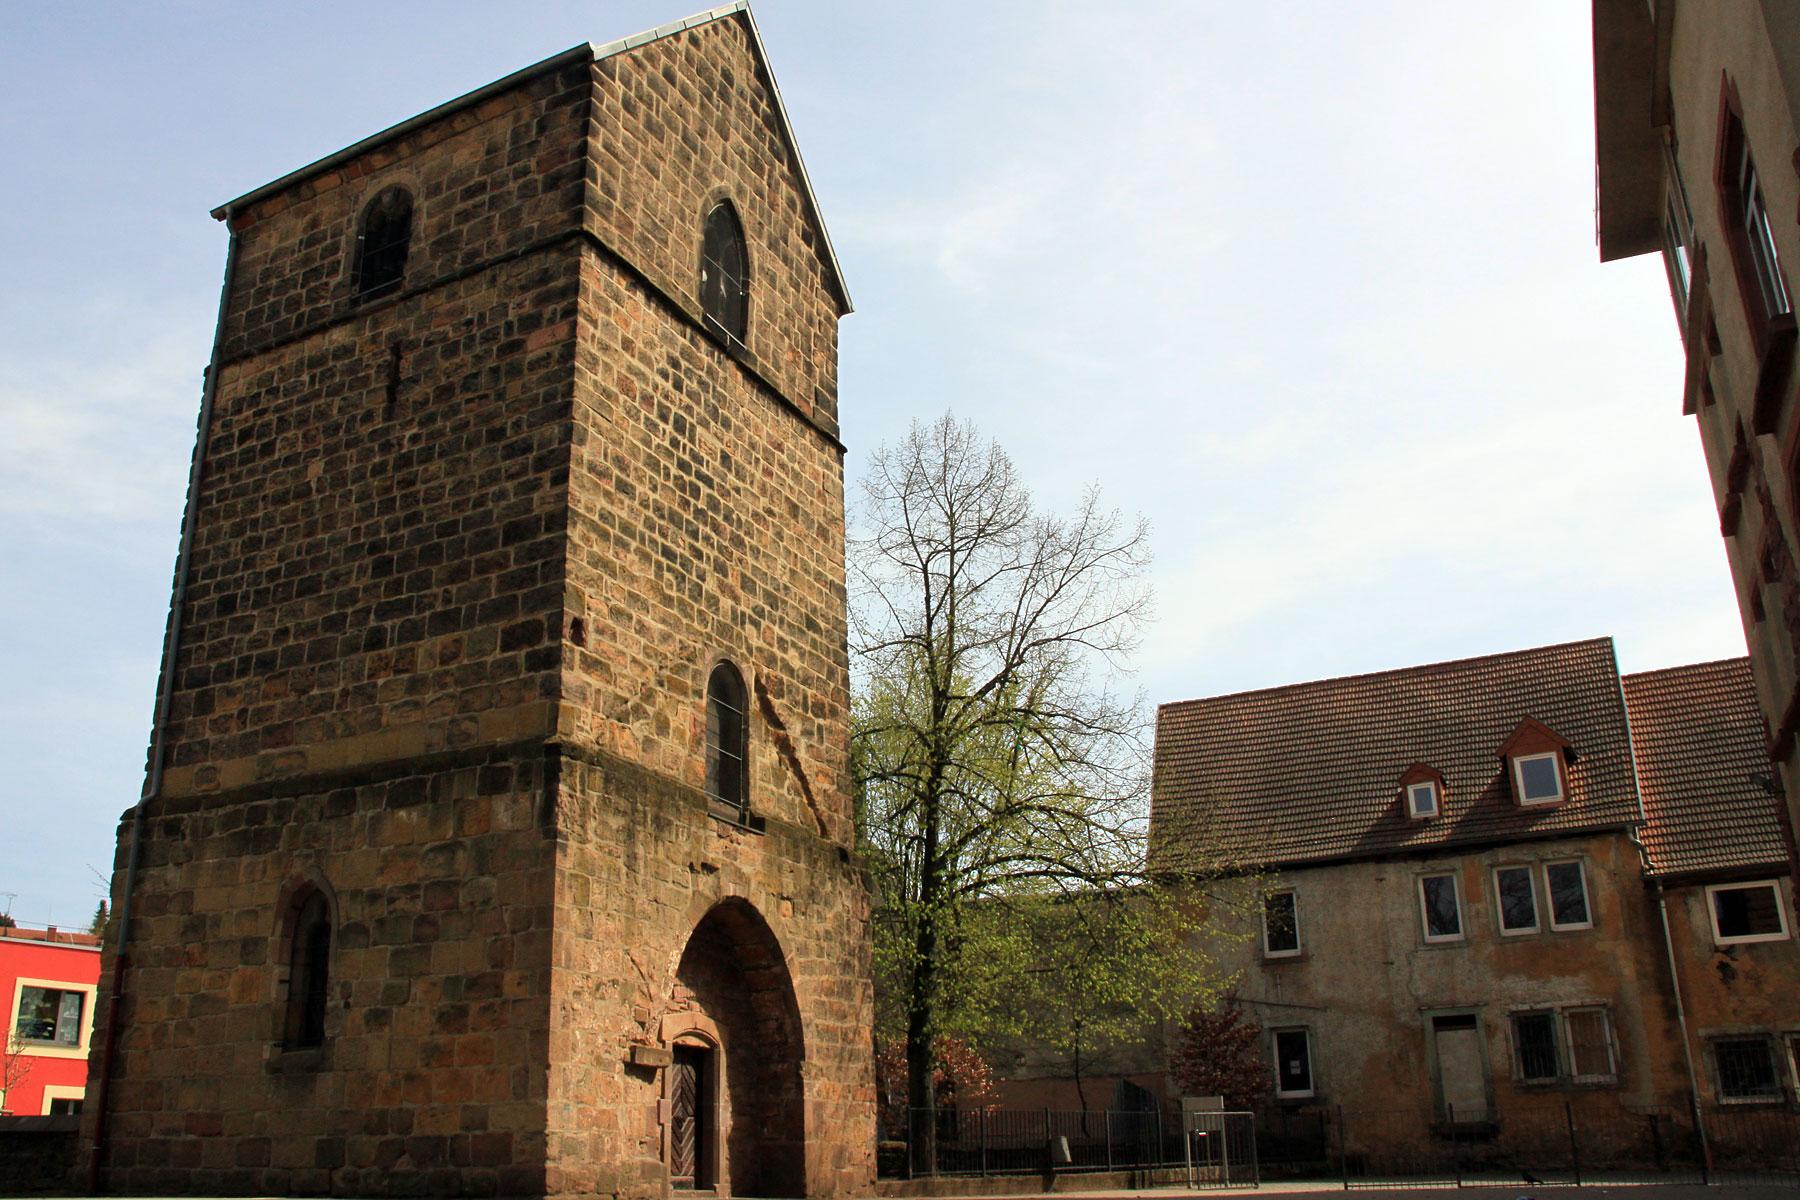 Alter Turm und Nebengebäude